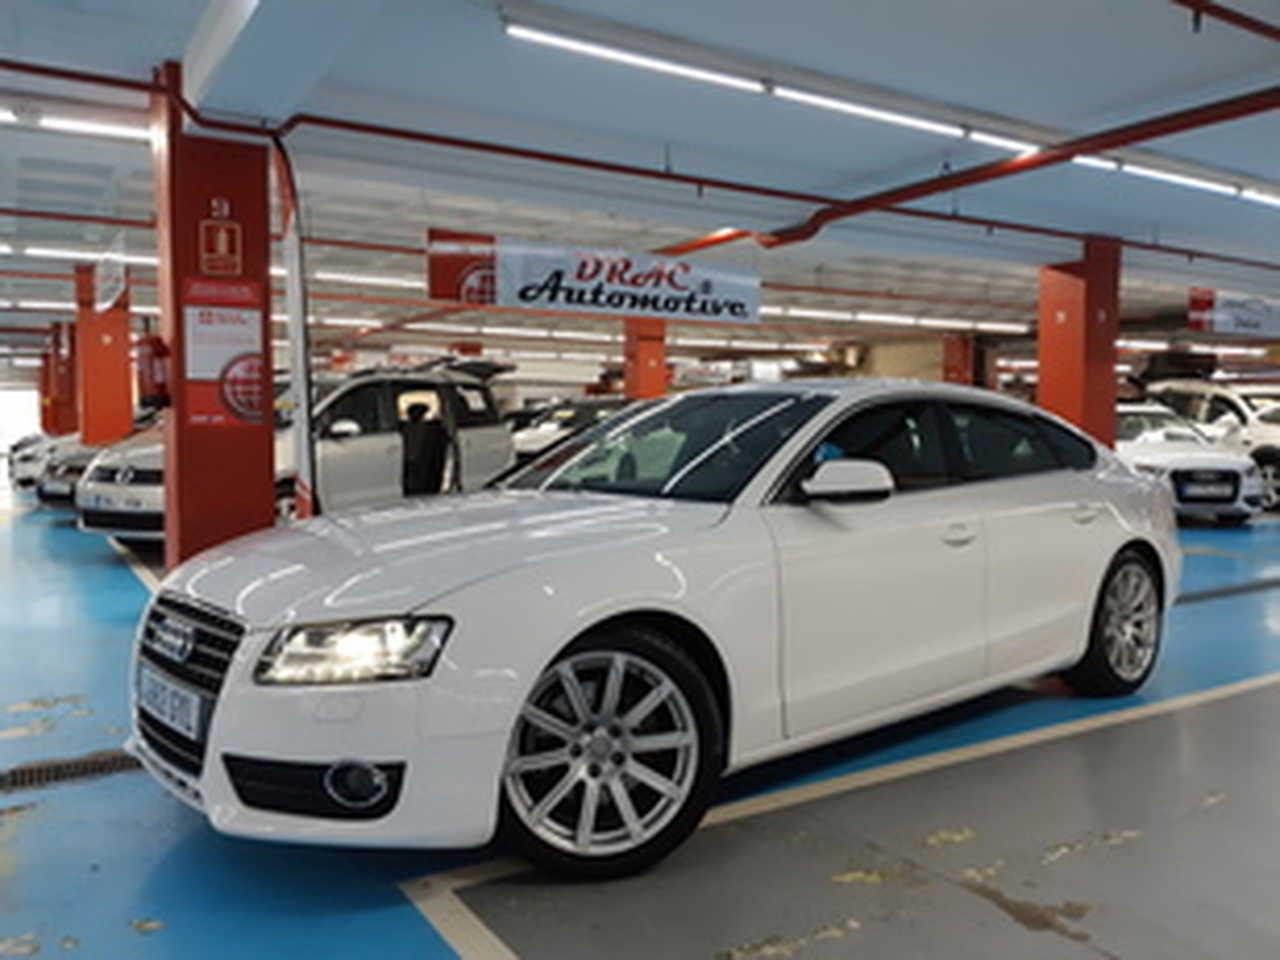 Audi A5 Sportback 2.0 TFSI 211 CV QUATTRO DSG S-LINE ESPECTACULAR  - Foto 1